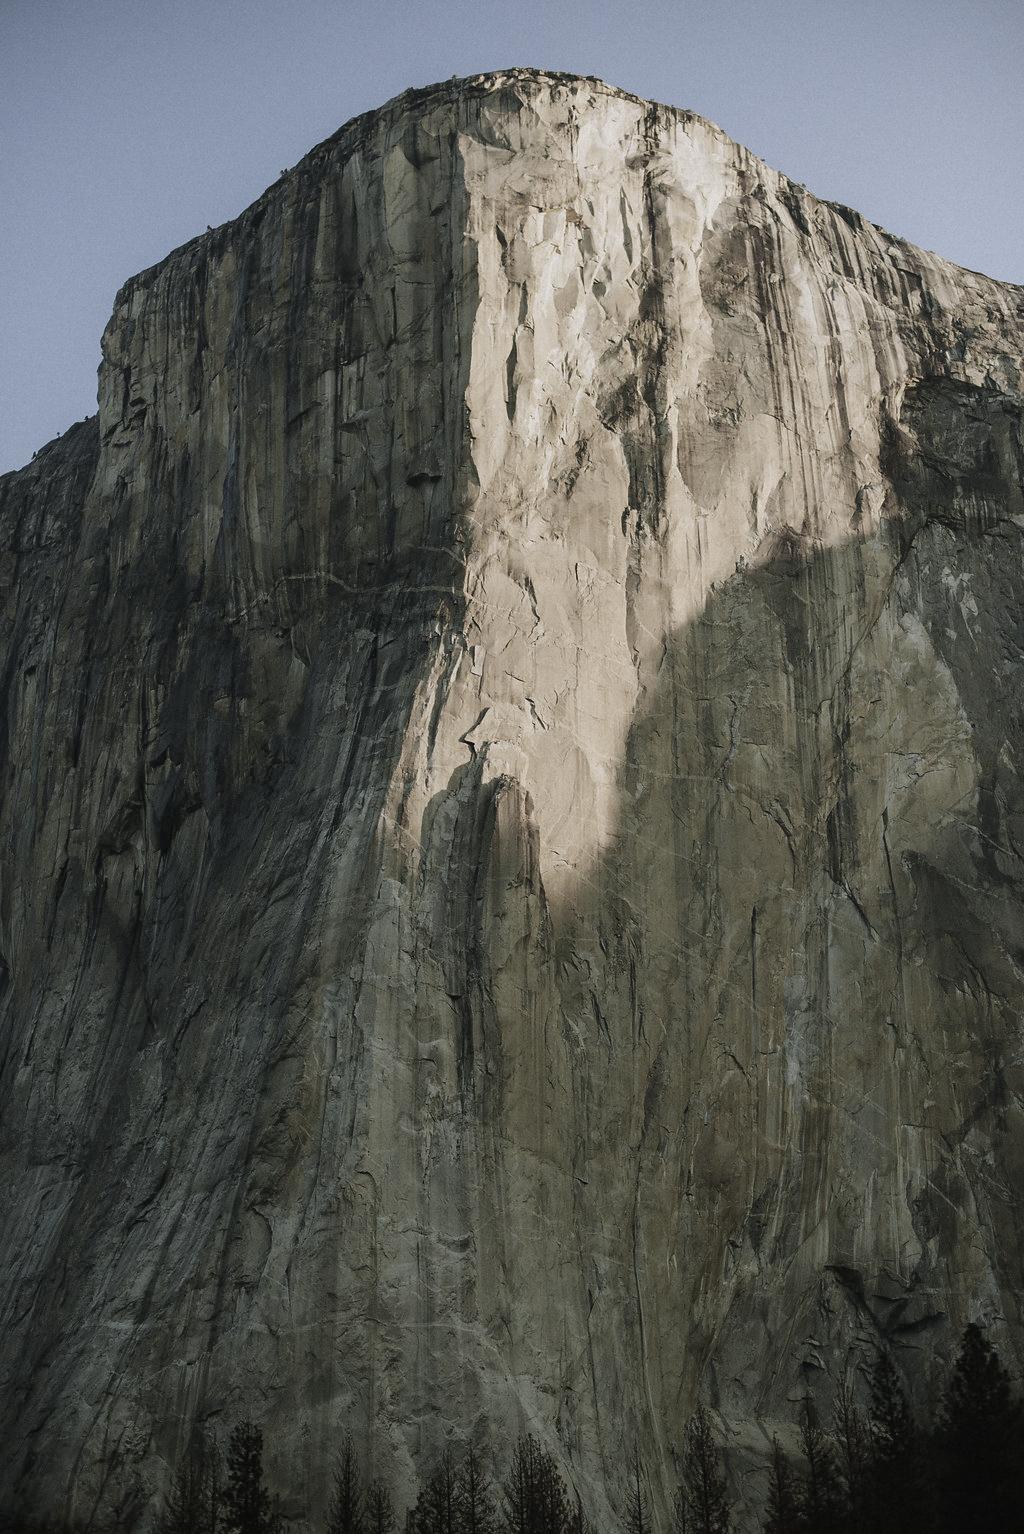 Granite El Capitan in Yosemite Valley at Sunrise in Winter.